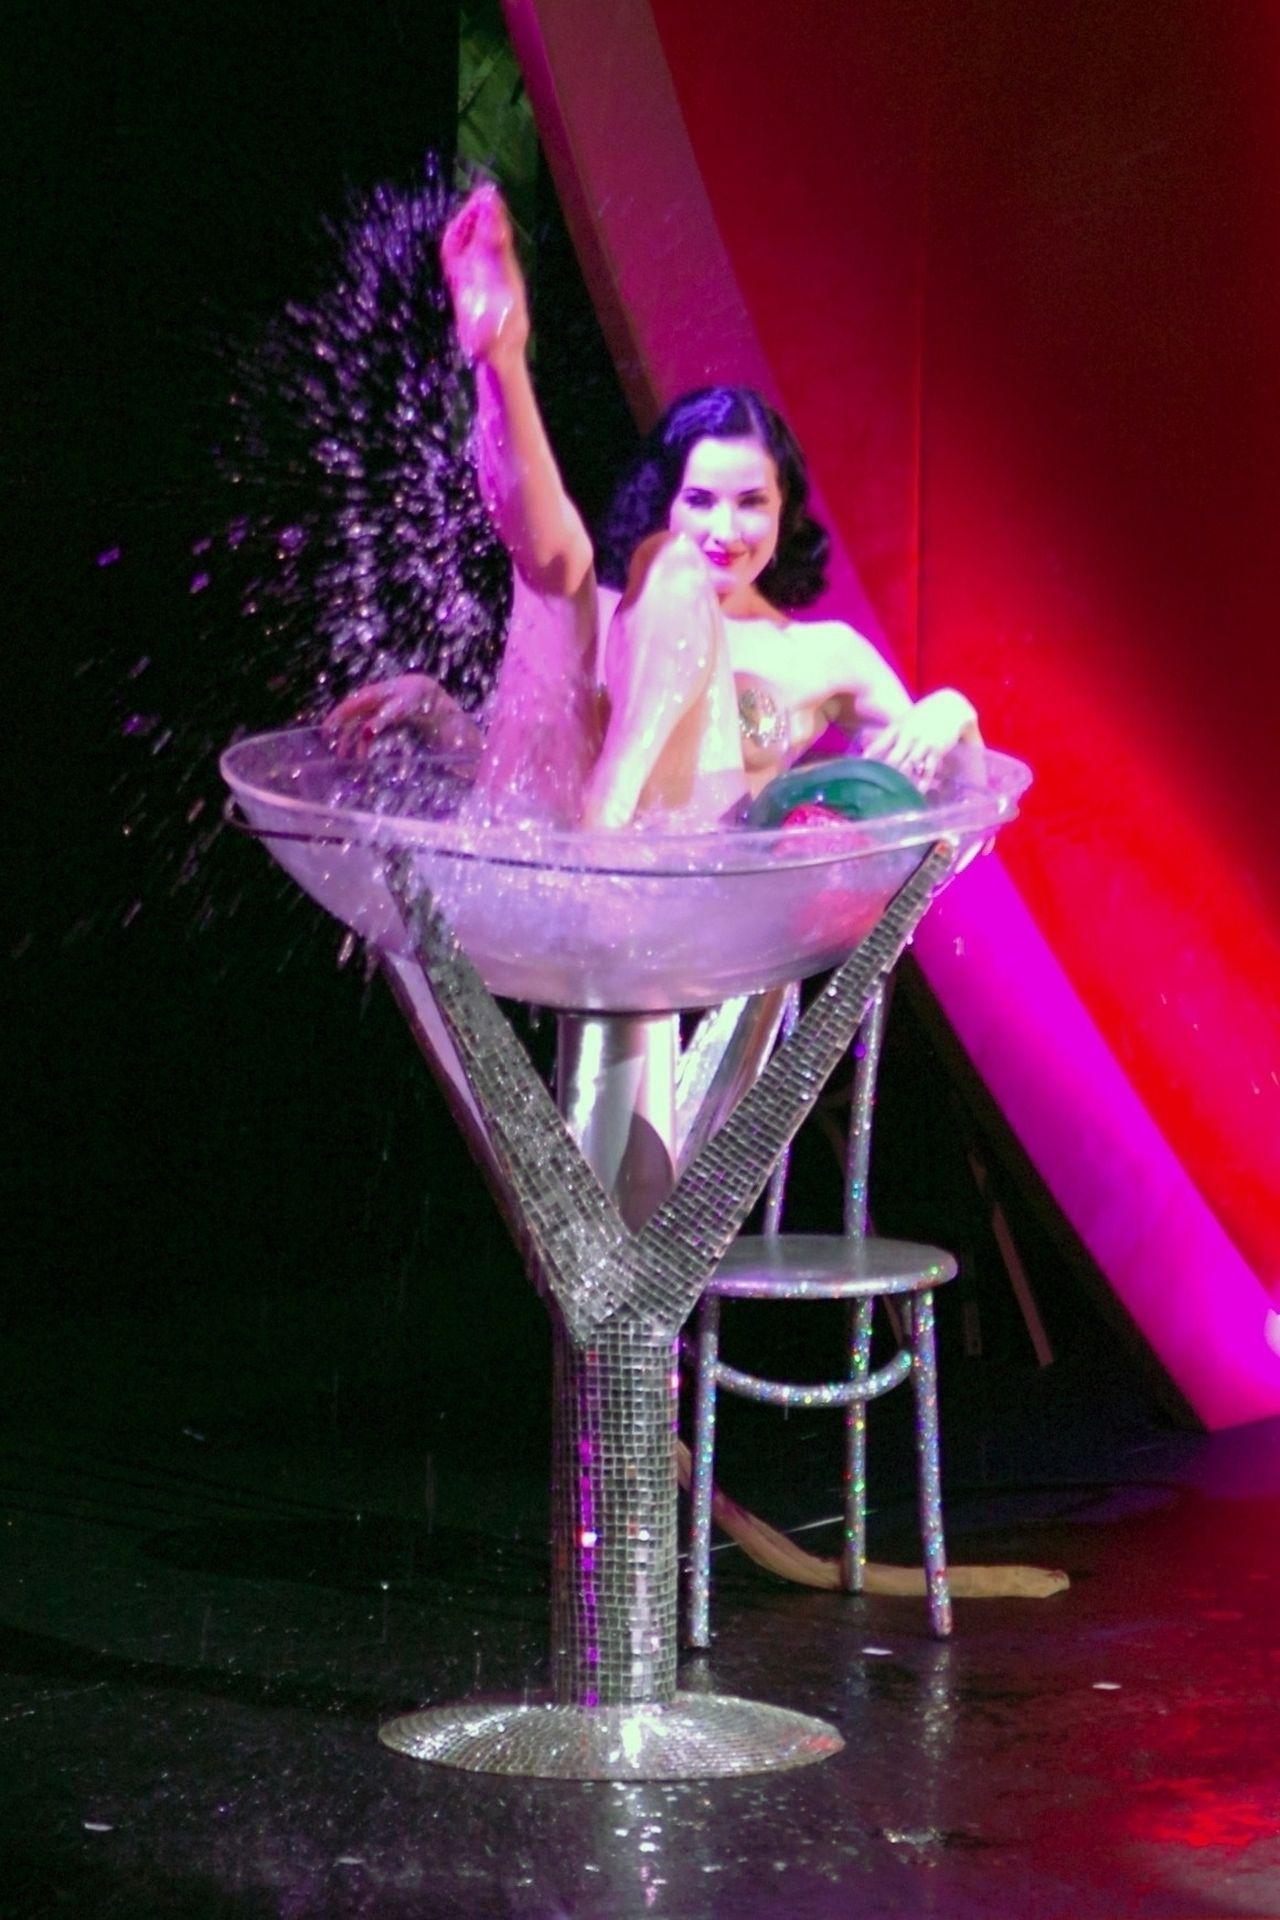 Dita Von Teese Performs At Erotica 06 In London 0040